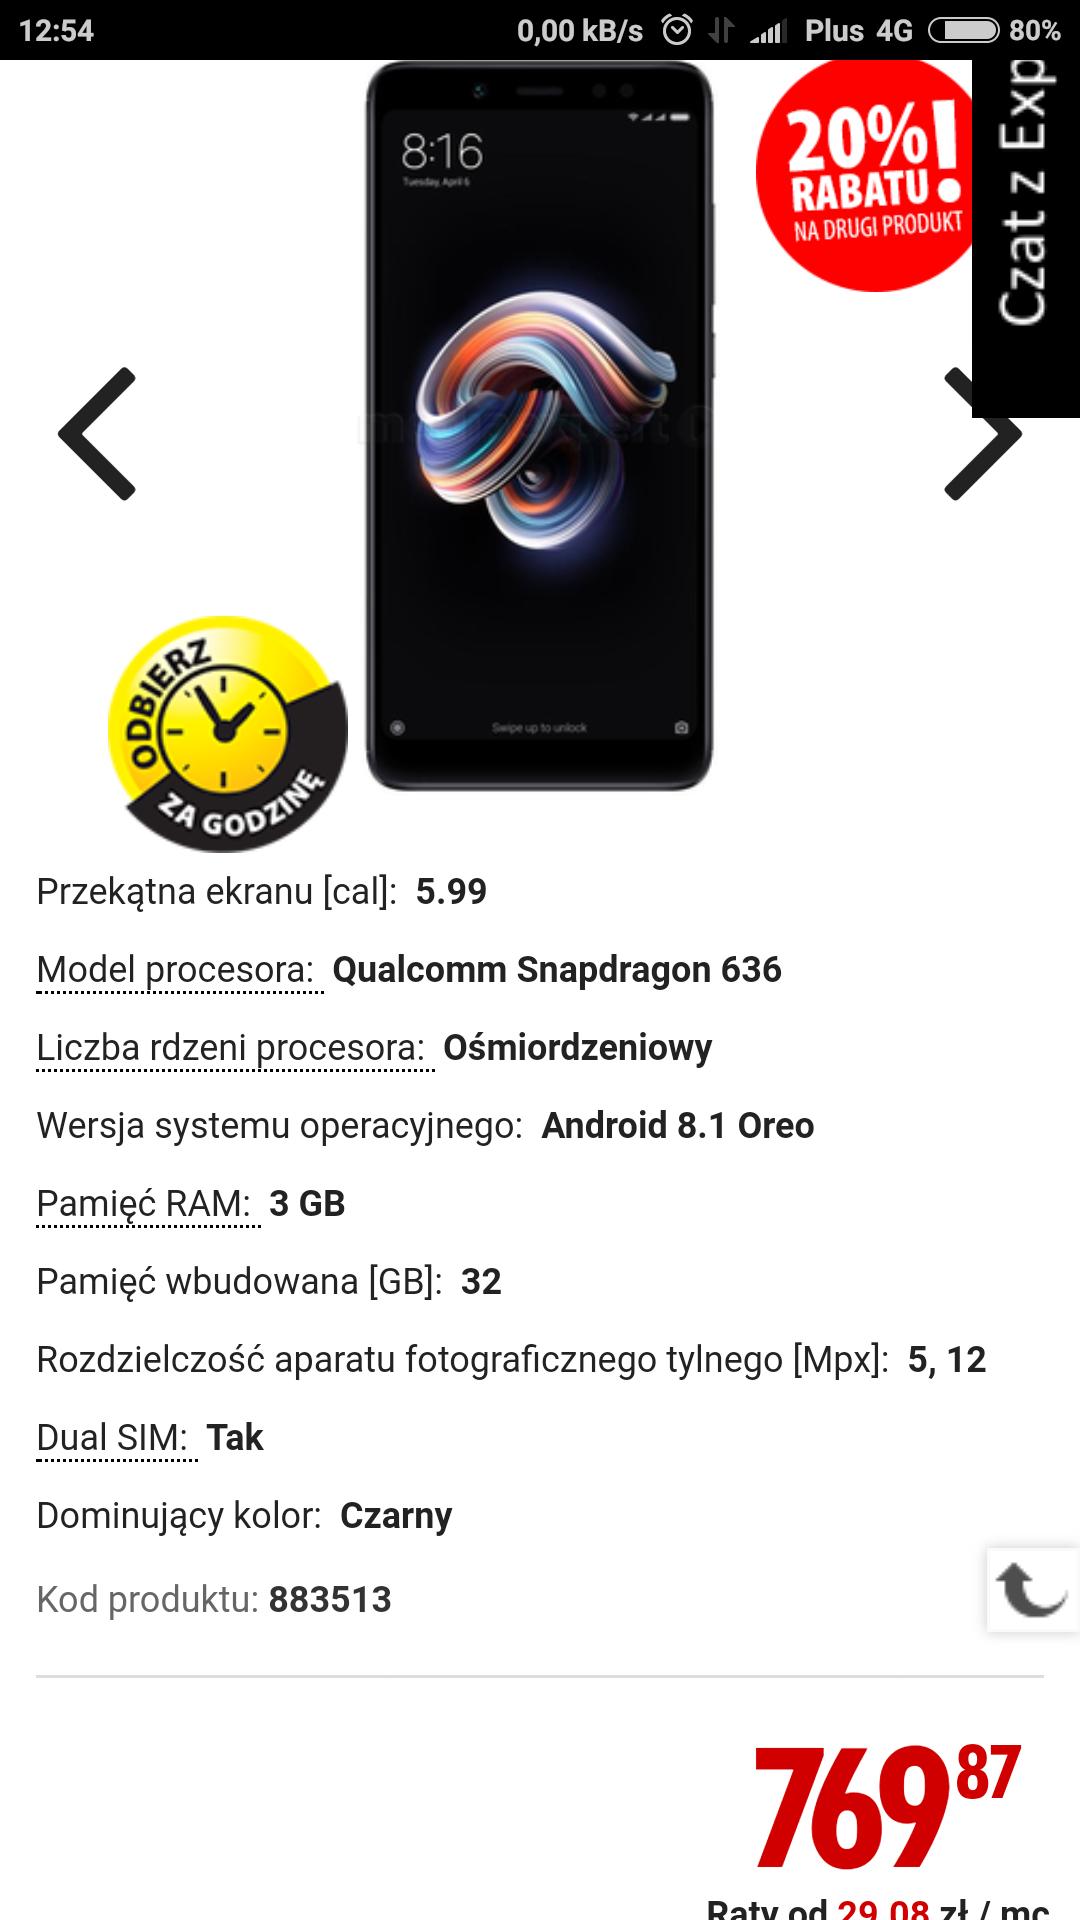 Xiaomi Redmi note 5 3/32 Media Expert